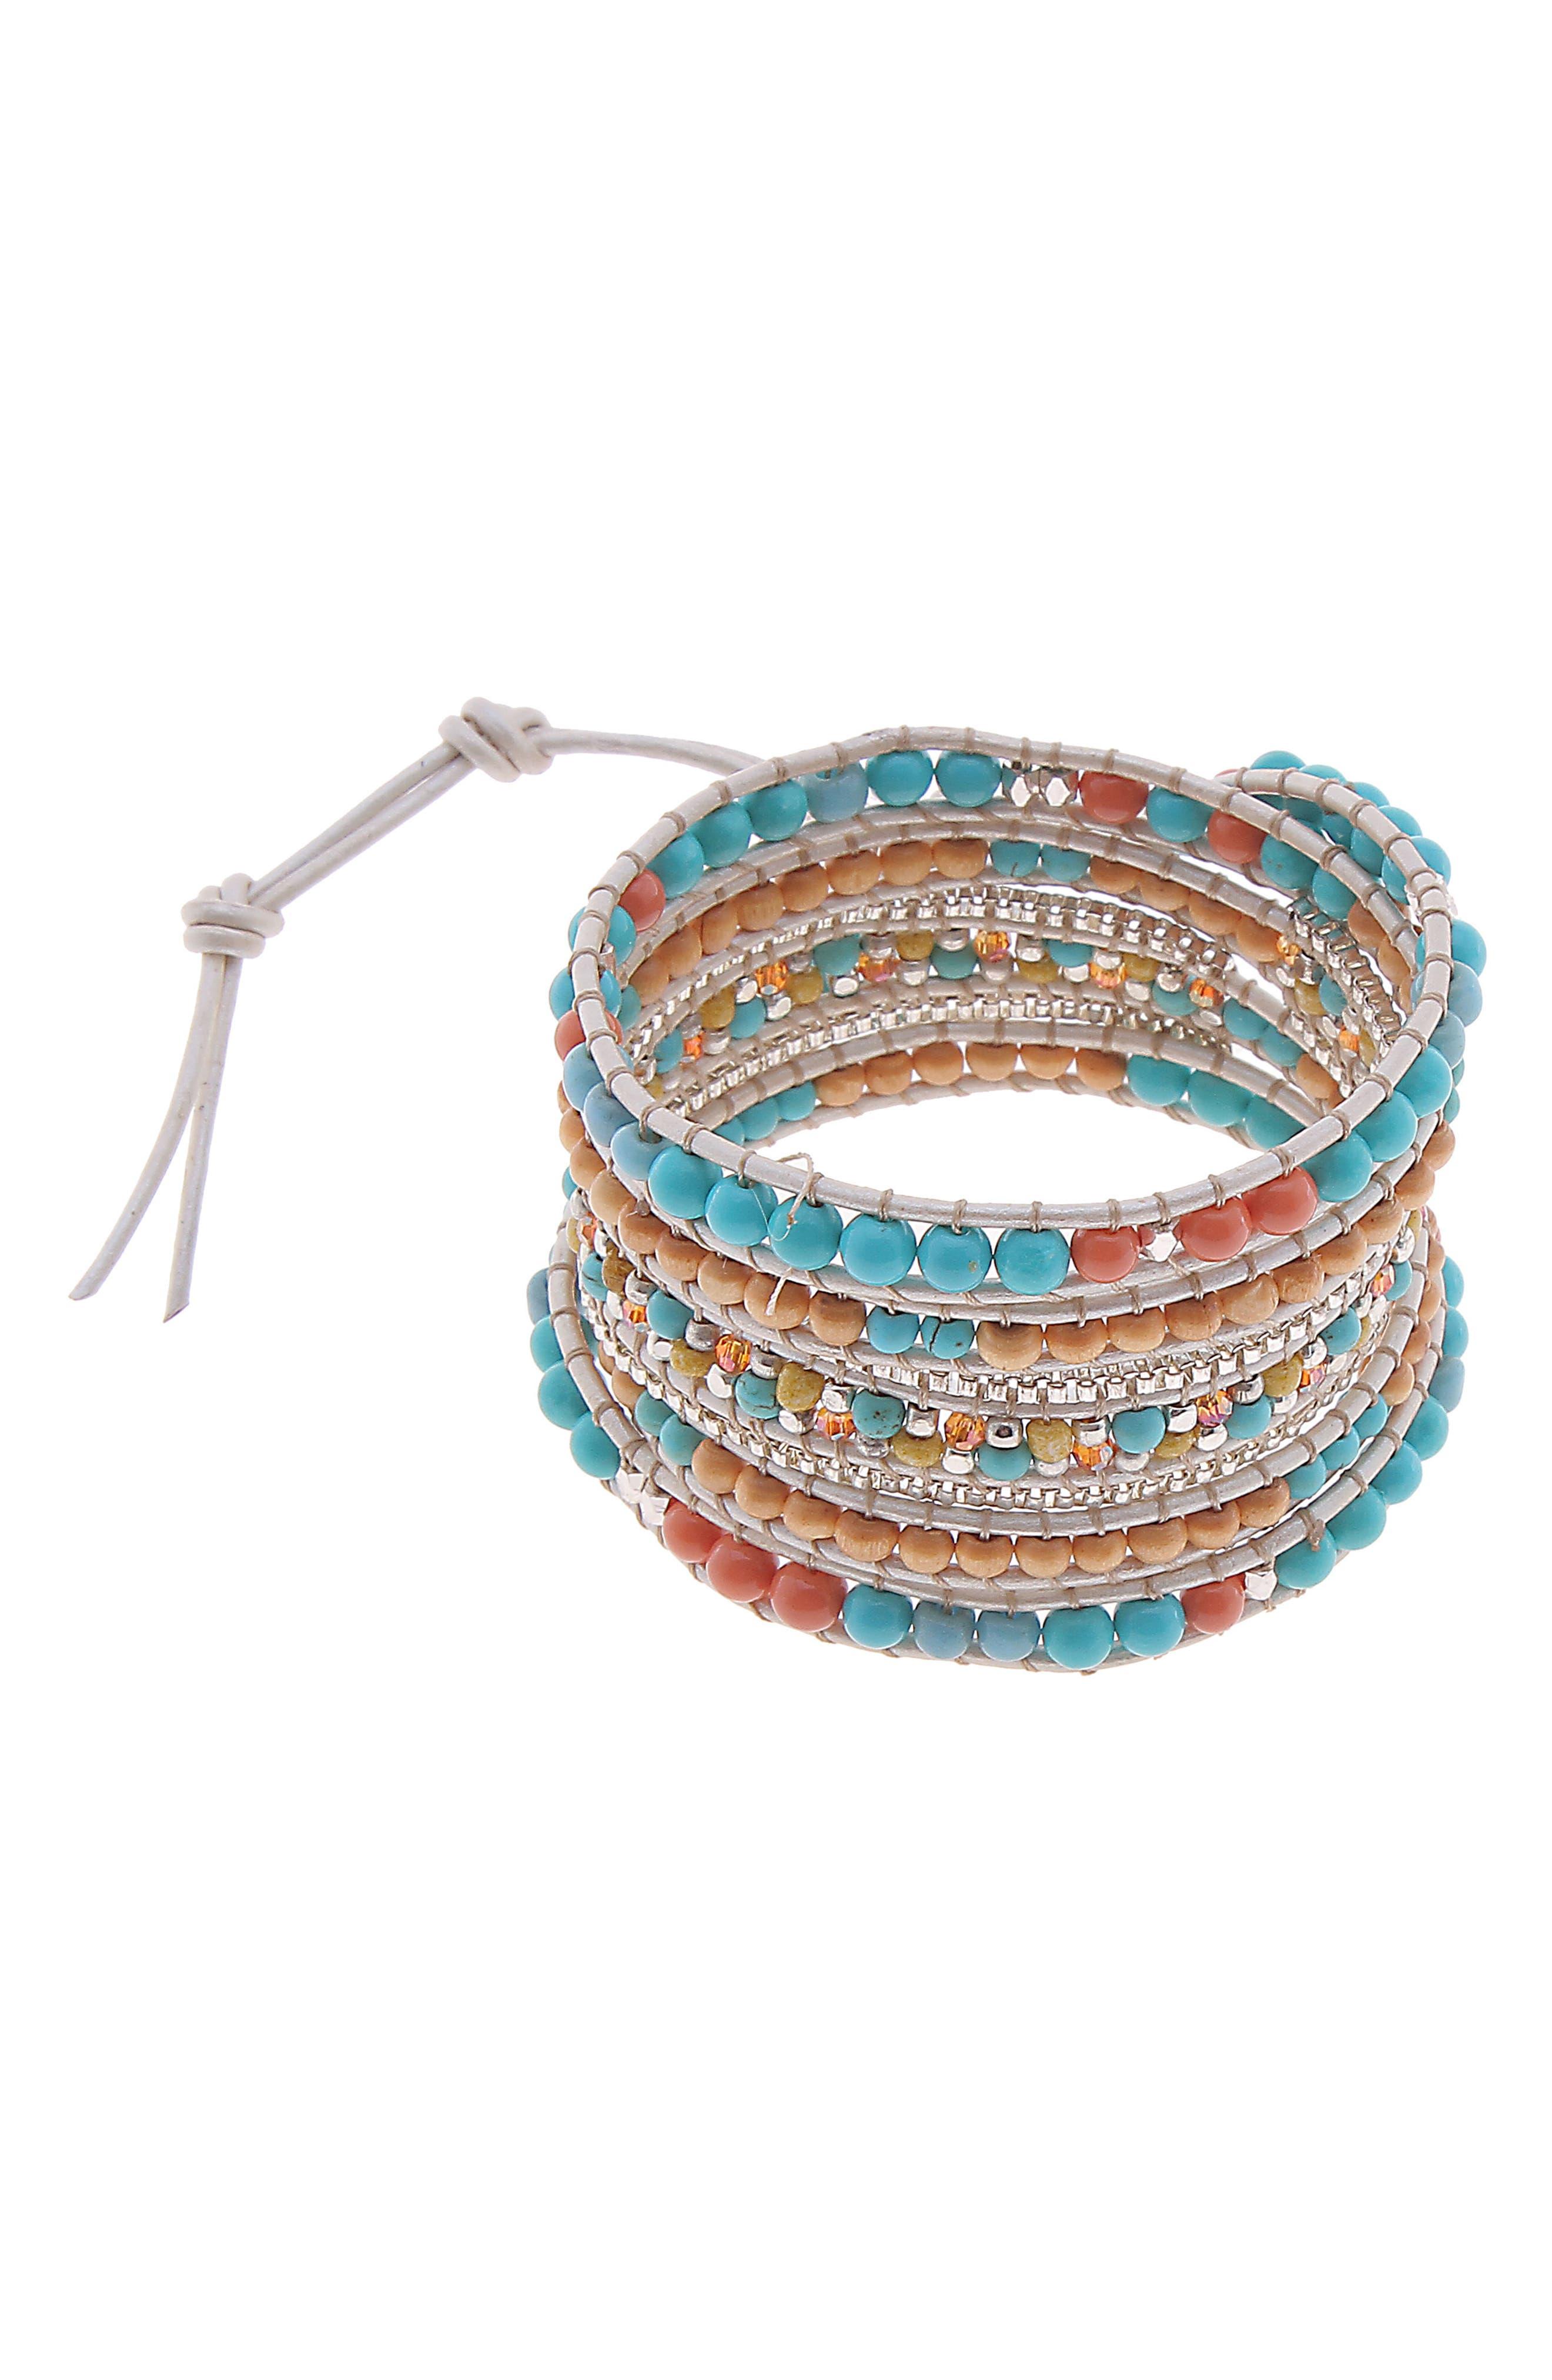 All Stone Wrap Bracelet,                         Main,                         color, Turquoise